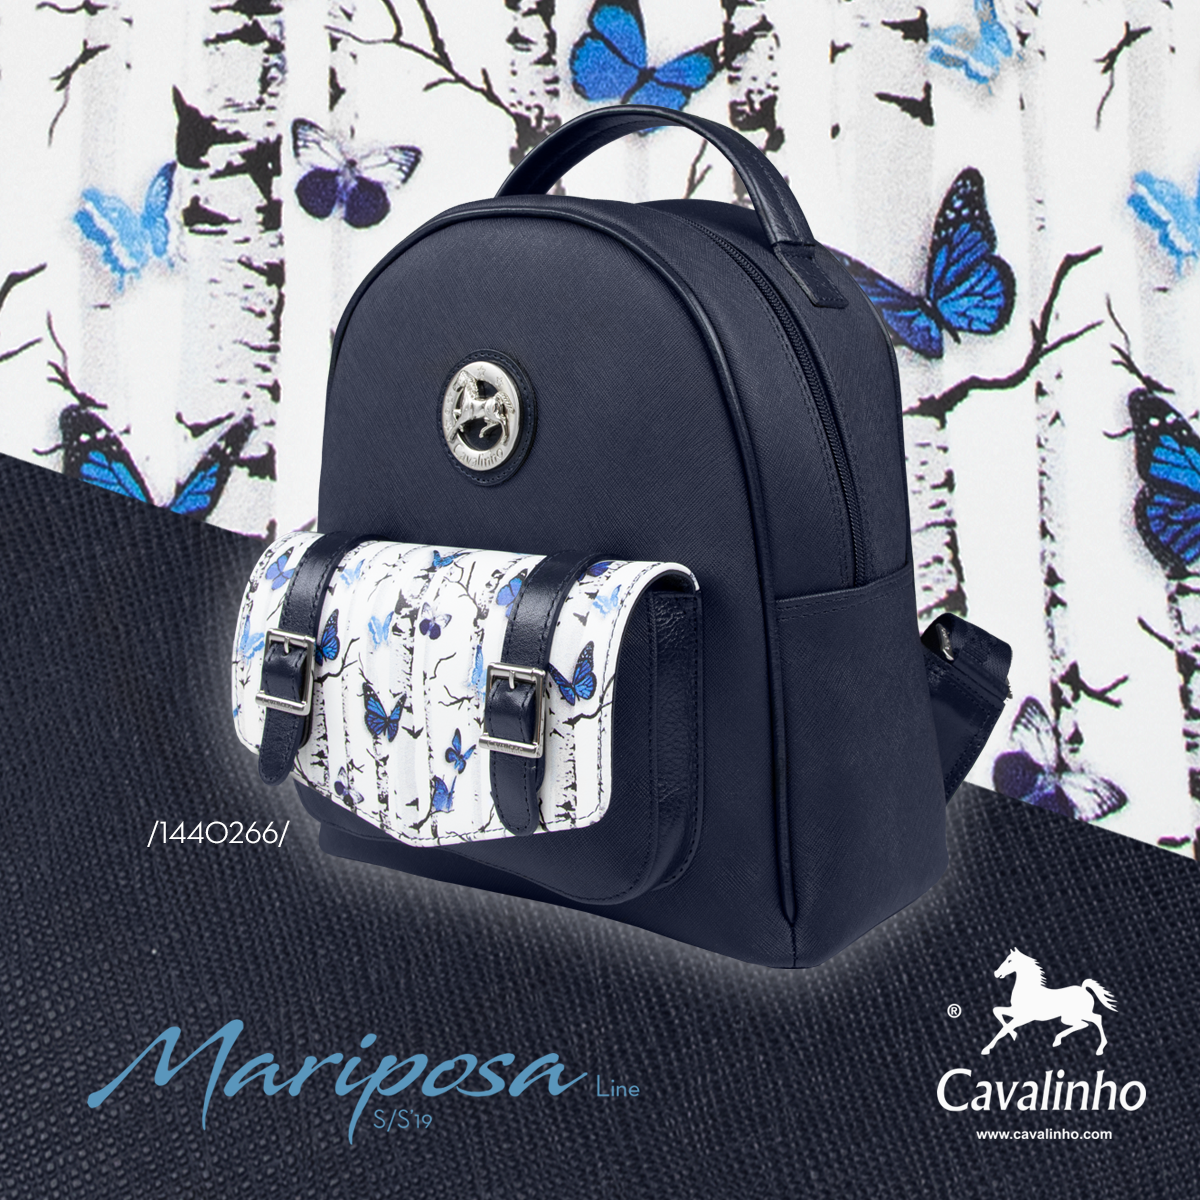 mariposa_post_03